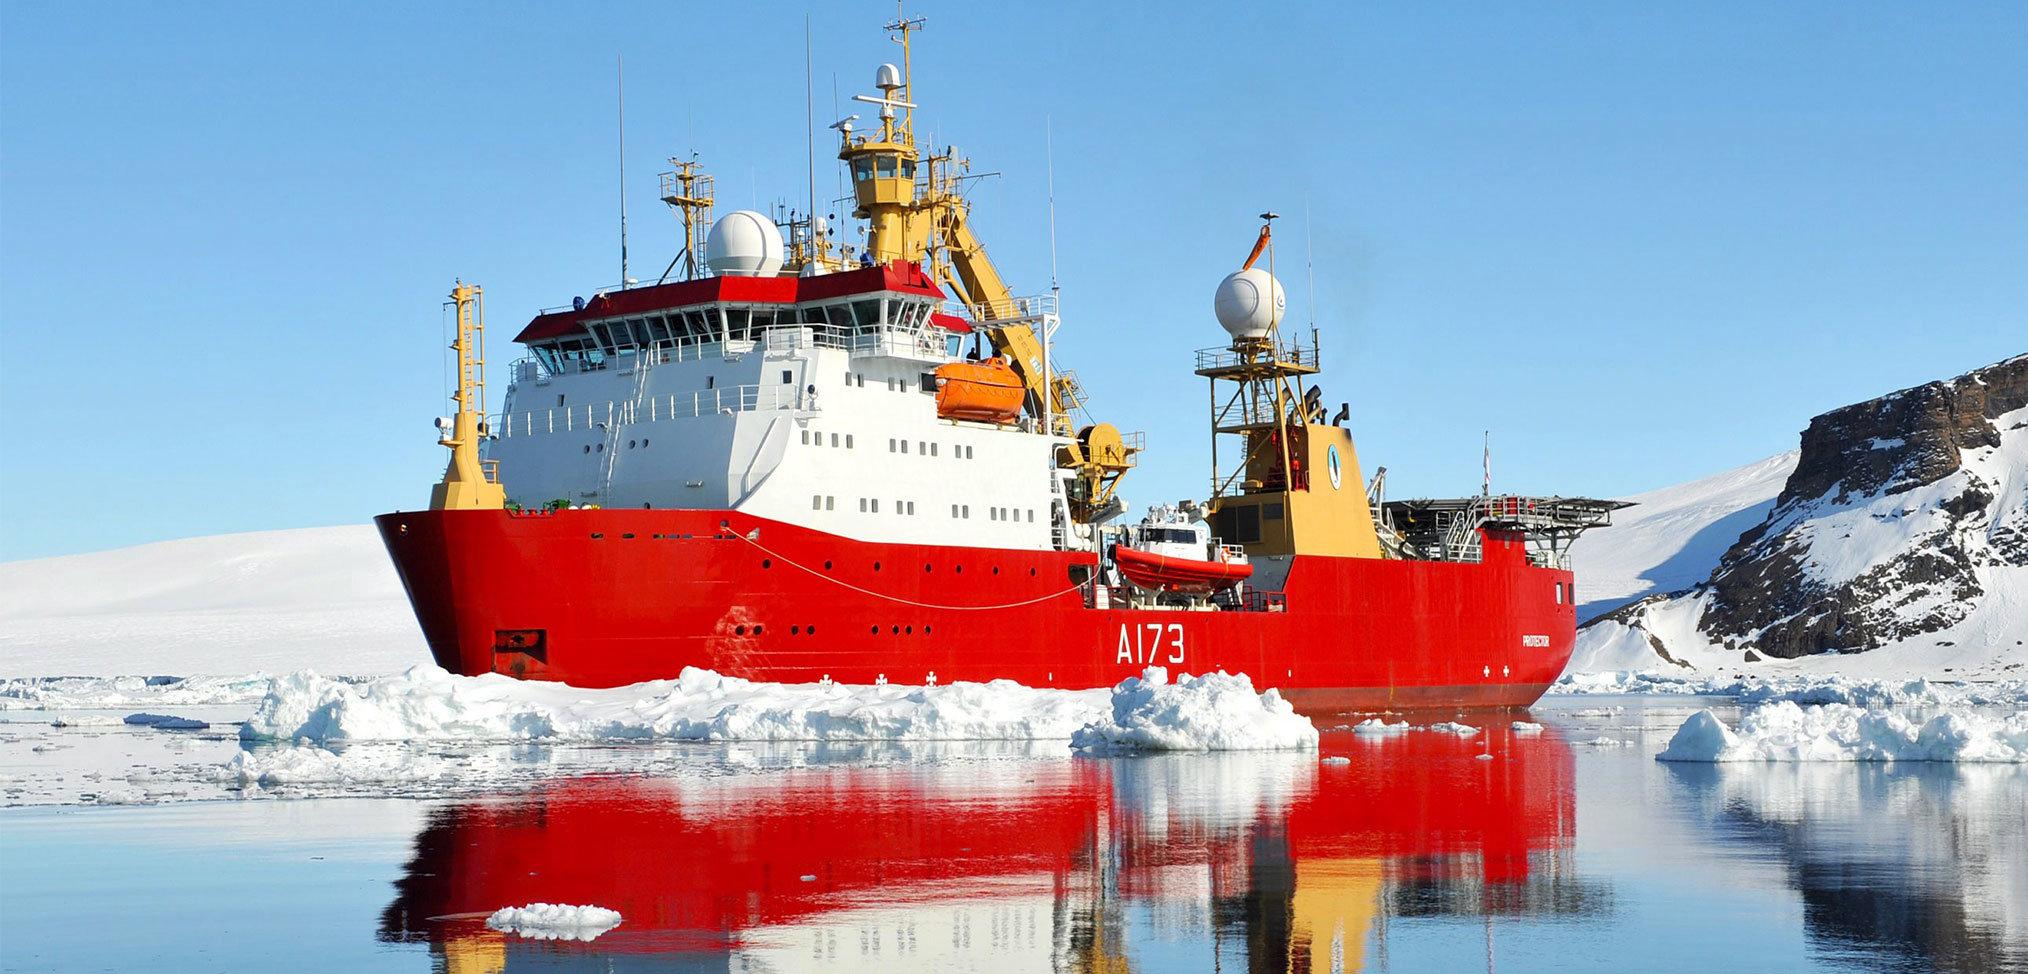 In focus: HMS Protector – the Royal Navy's Antarctic patrol ship